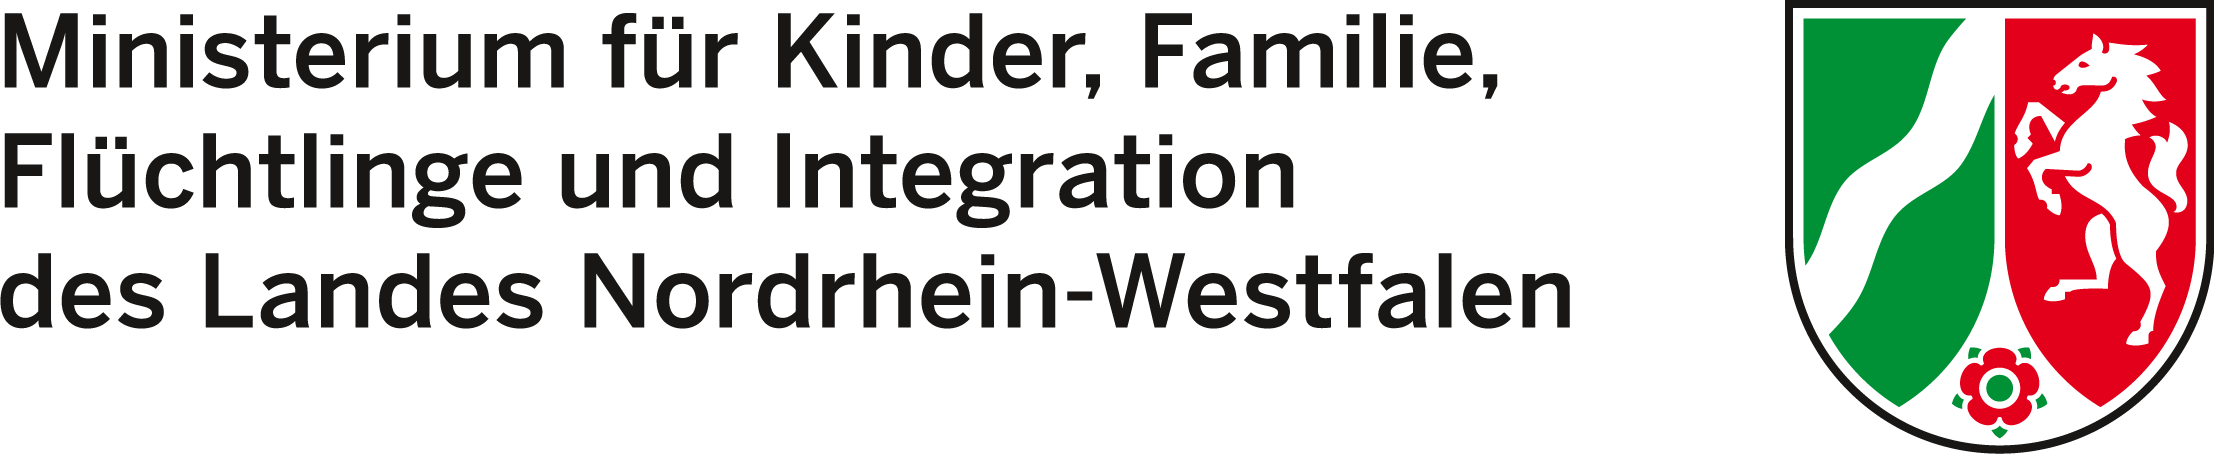 Logo des Ministeriums für Kinder, Familie, Flüchtlinge und Integration des Landes NRW (MKFFI)